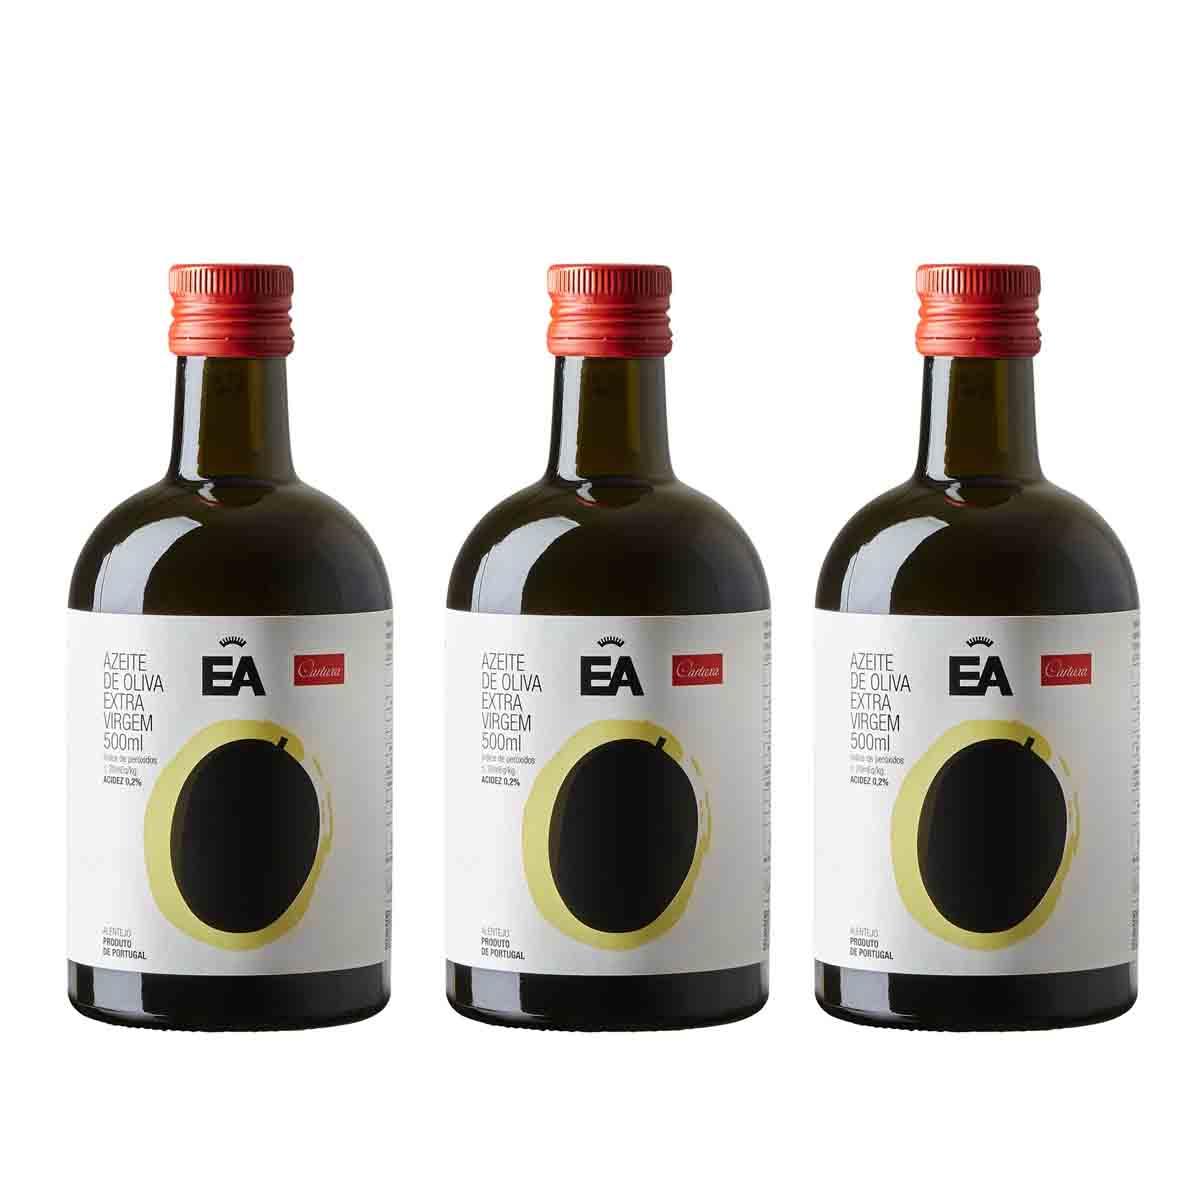 Kit 3 Azeite de oliva extra virgem Português EA Cartuxa 500ml